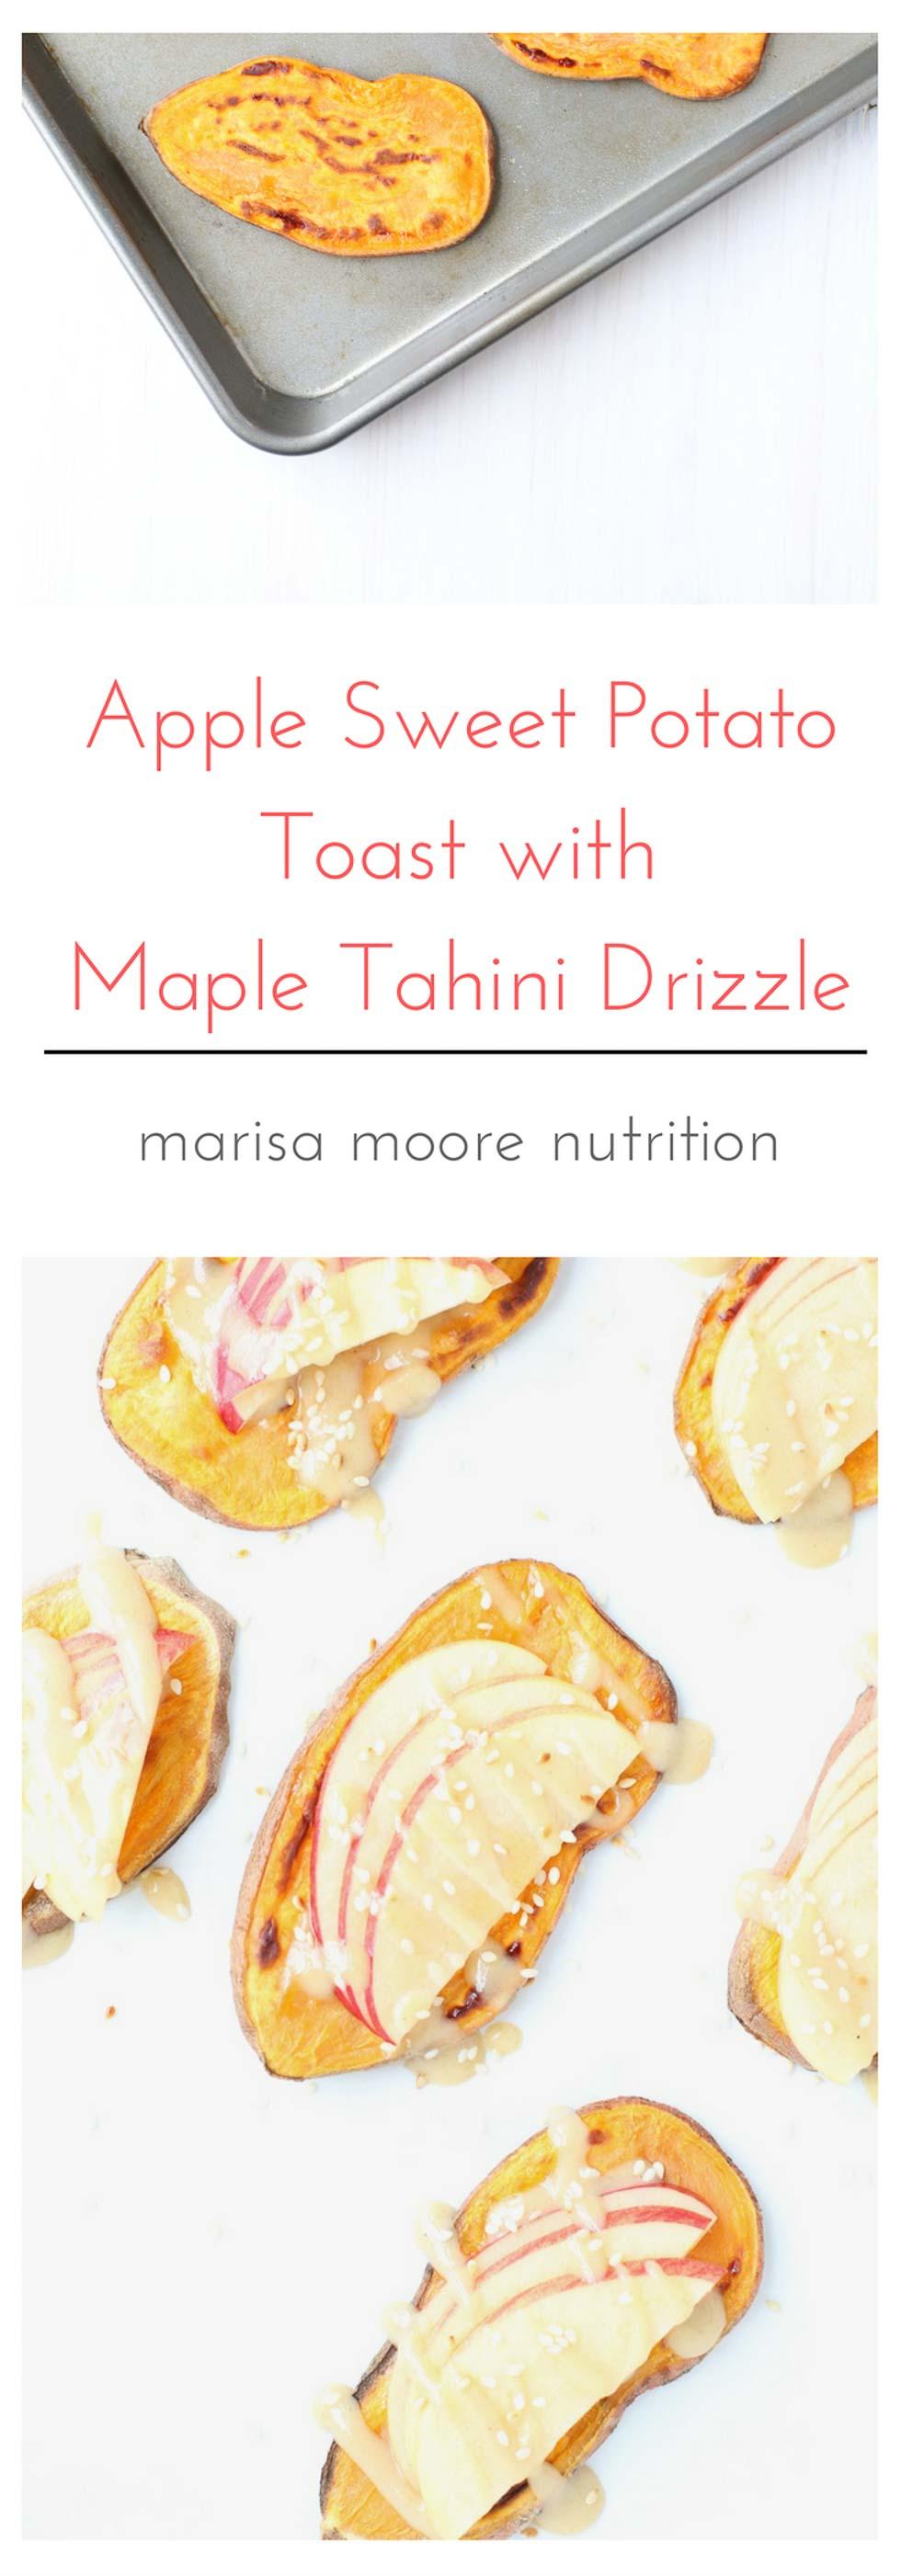 Apple Sweet Potato Toast with Maple Tahini Drizzle